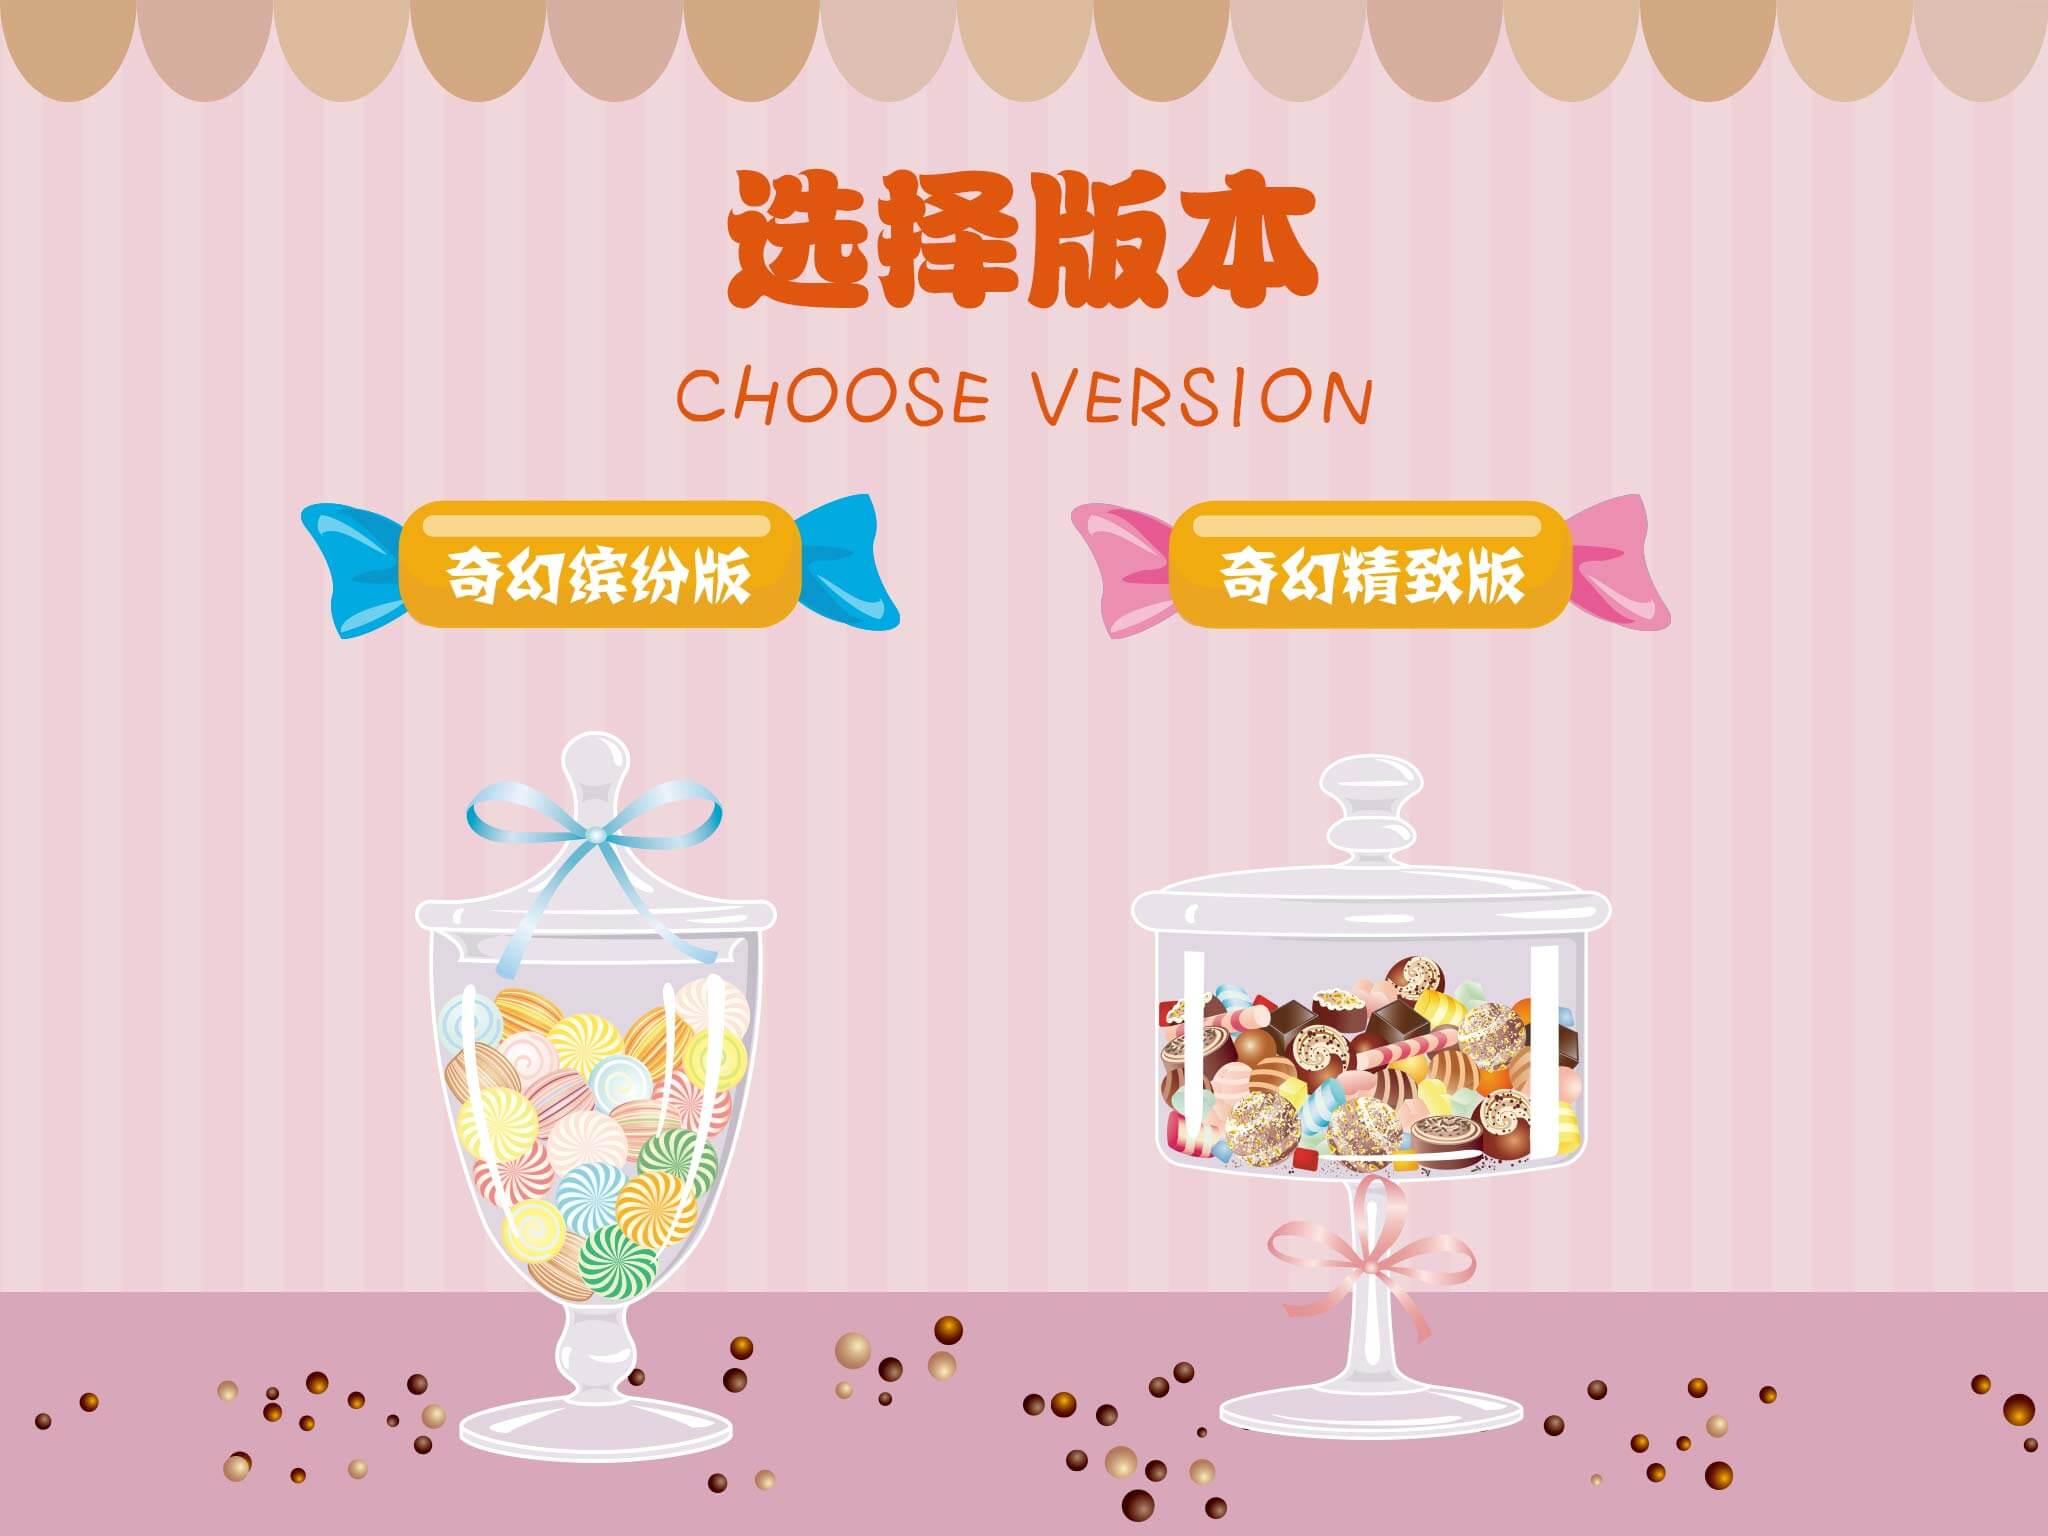 3d早教智玩具app水果v玩具页面水果2-3种娃娃图片